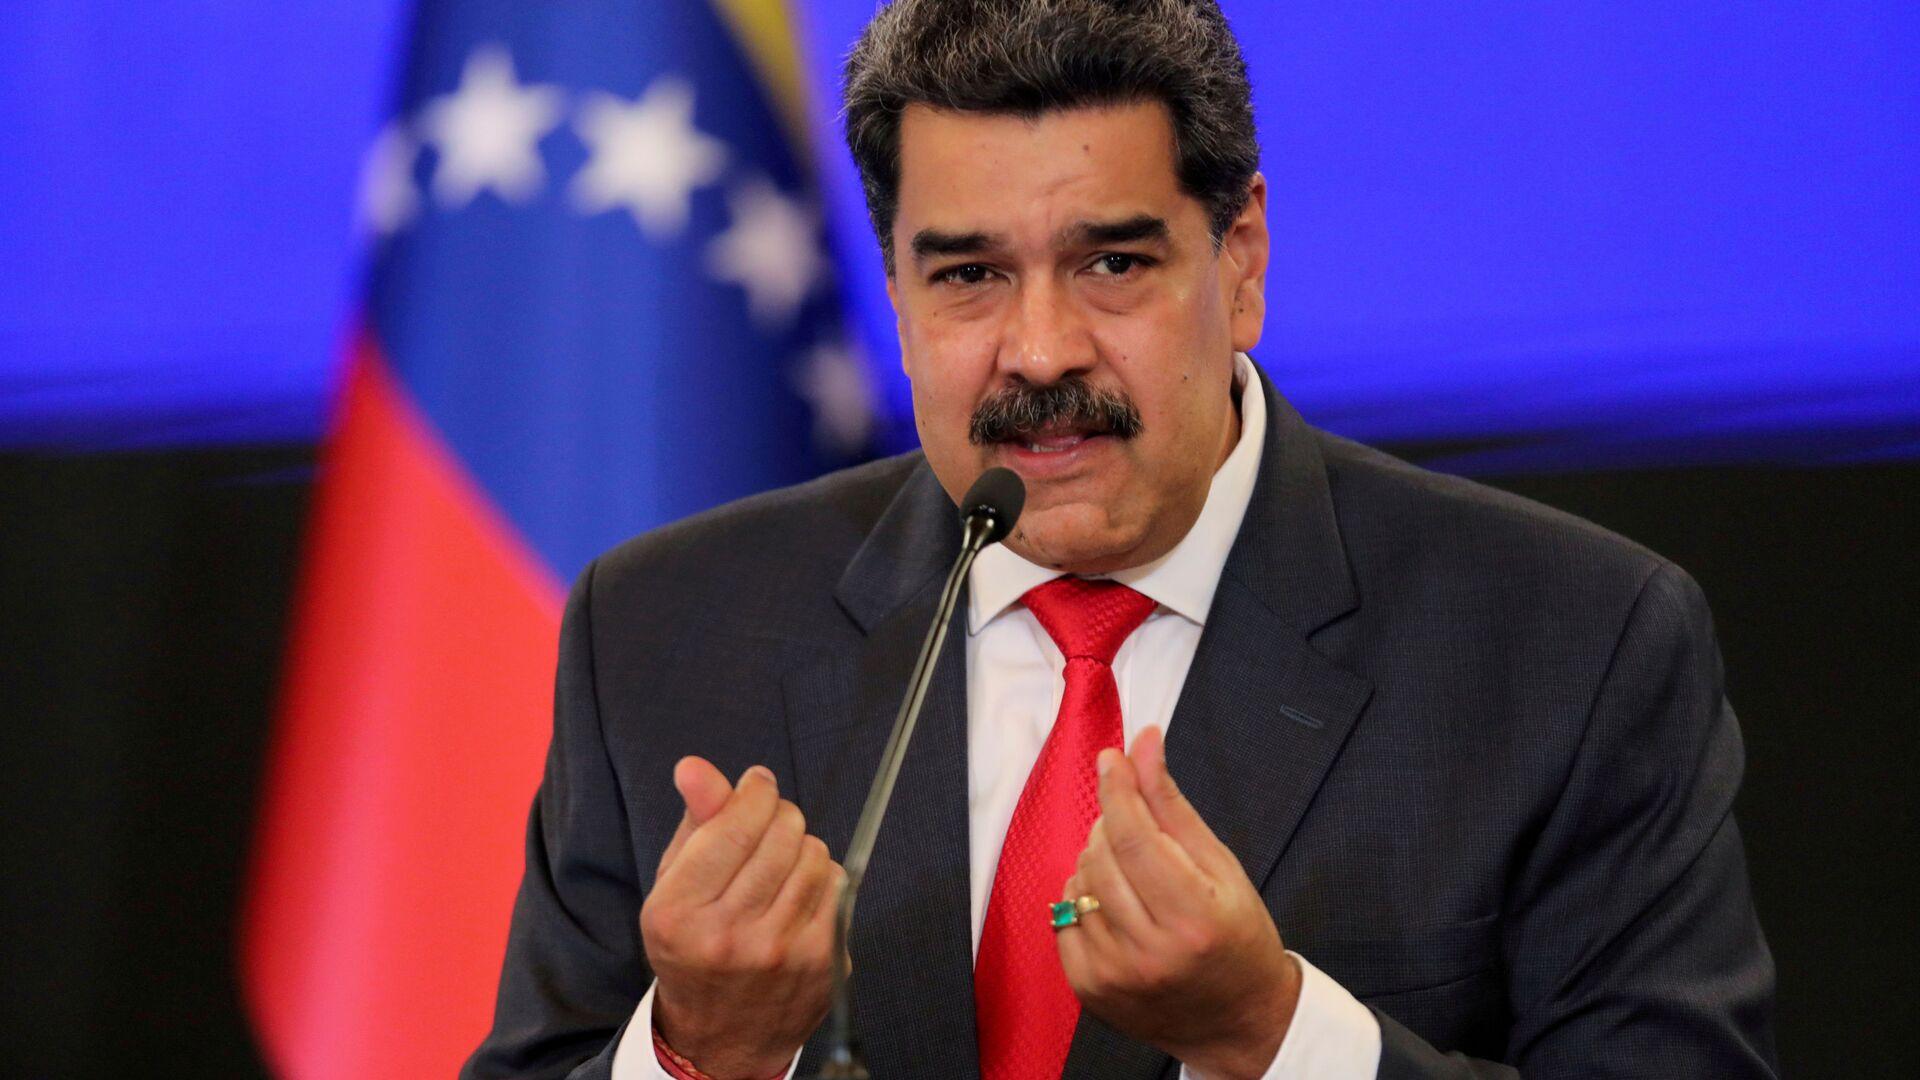 Prezydent Wenezueli Nicolas Maduro. - Sputnik Polska, 1920, 29.03.2021